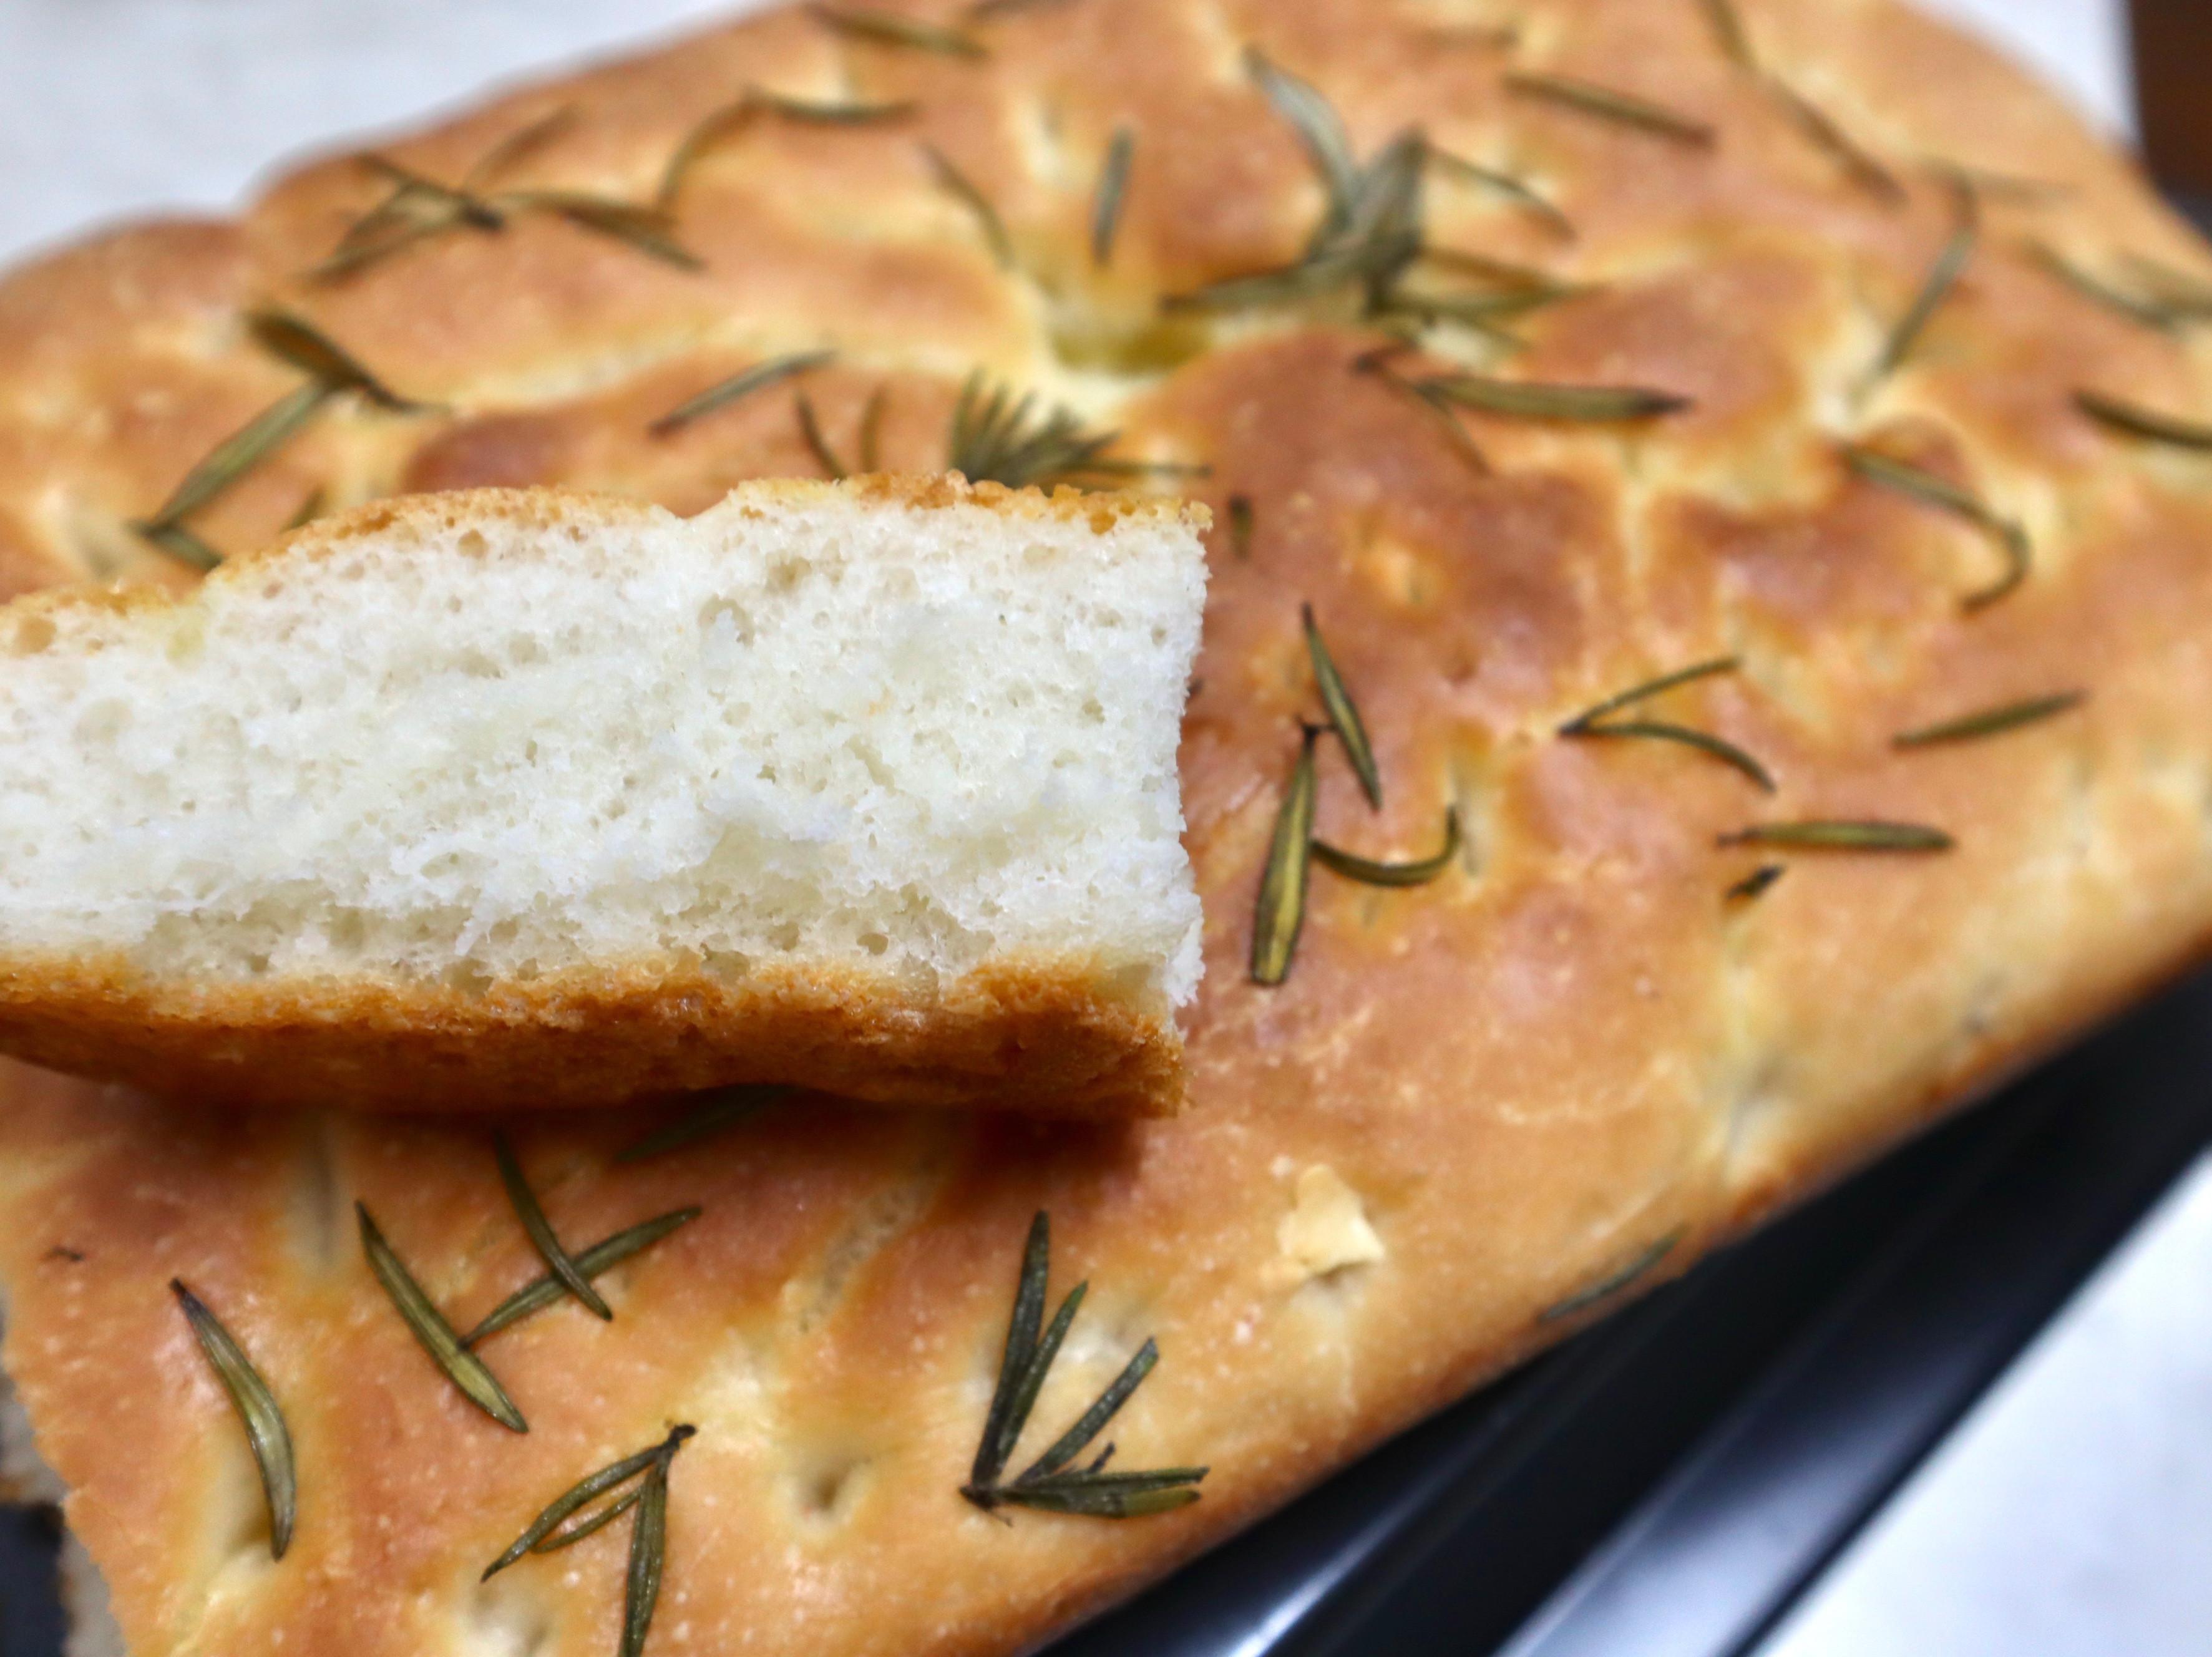 意大利香草麵包 Focaccia